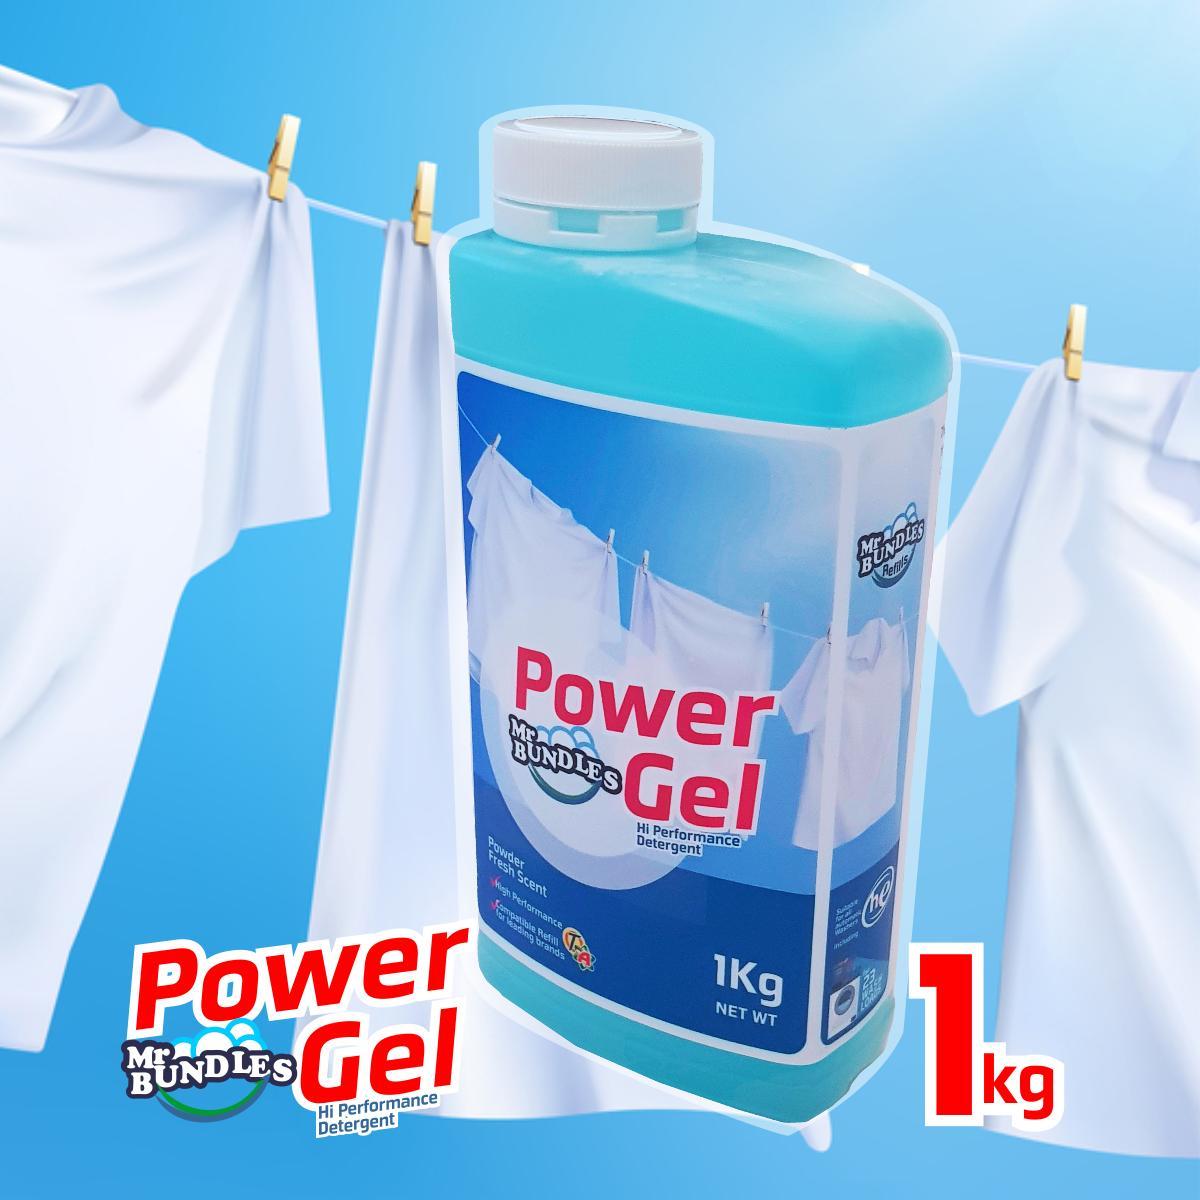 Mr Bundles Power Gel Detergent Regular Size 1kg